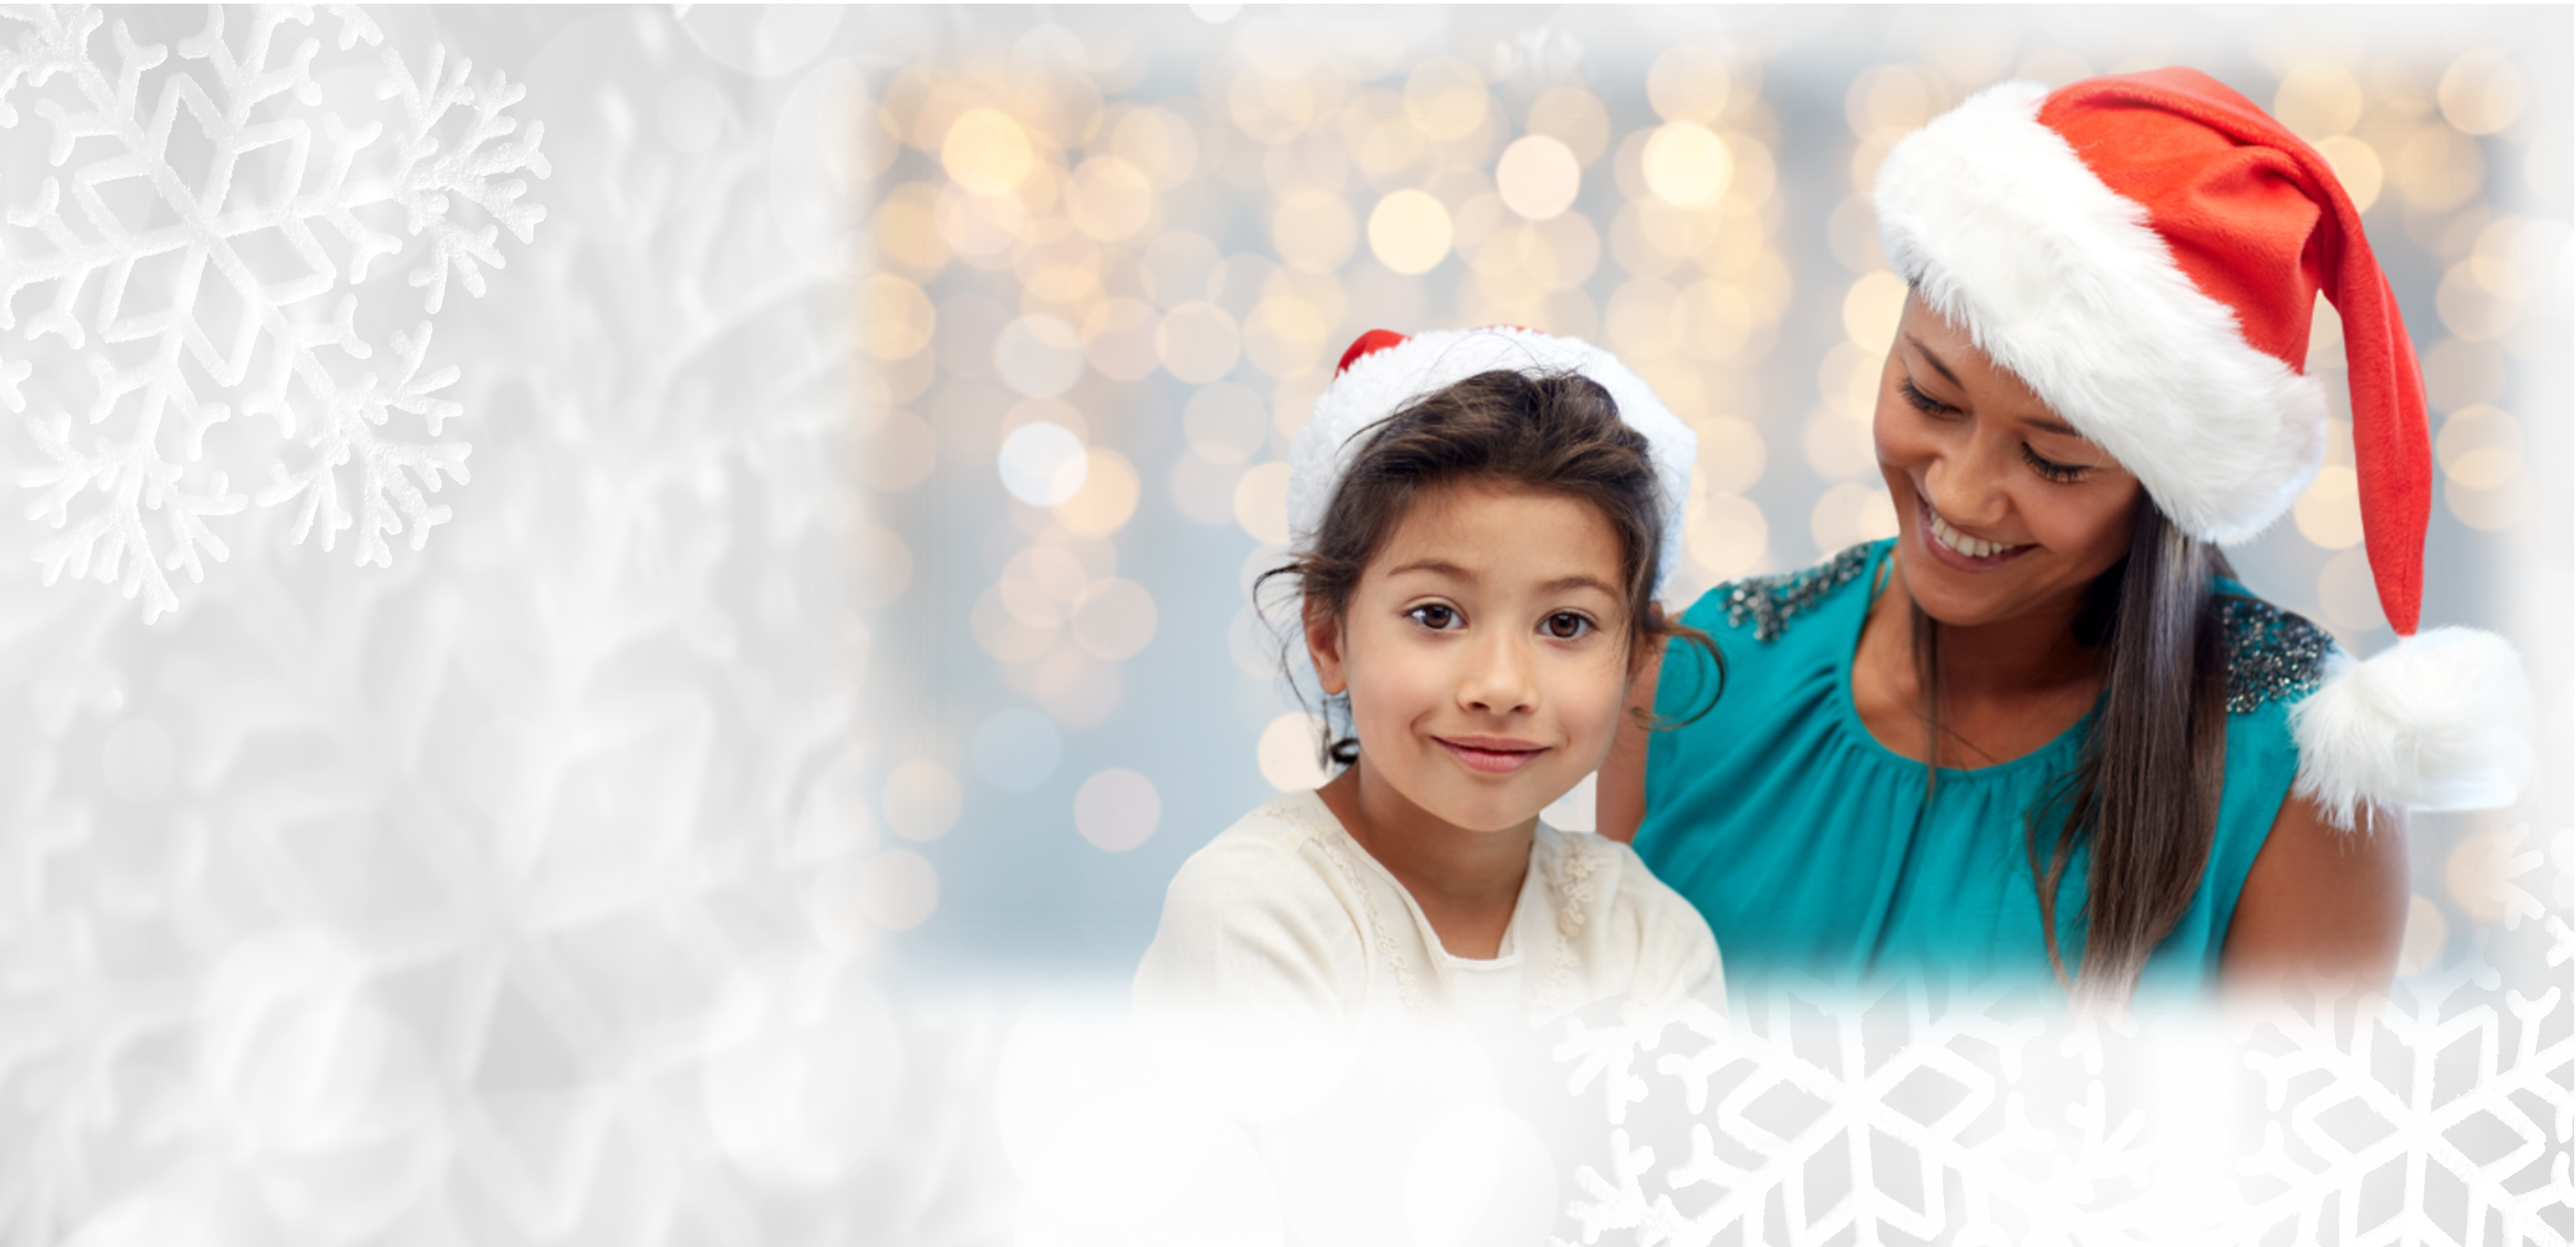 Support Survivors This Holiday Season